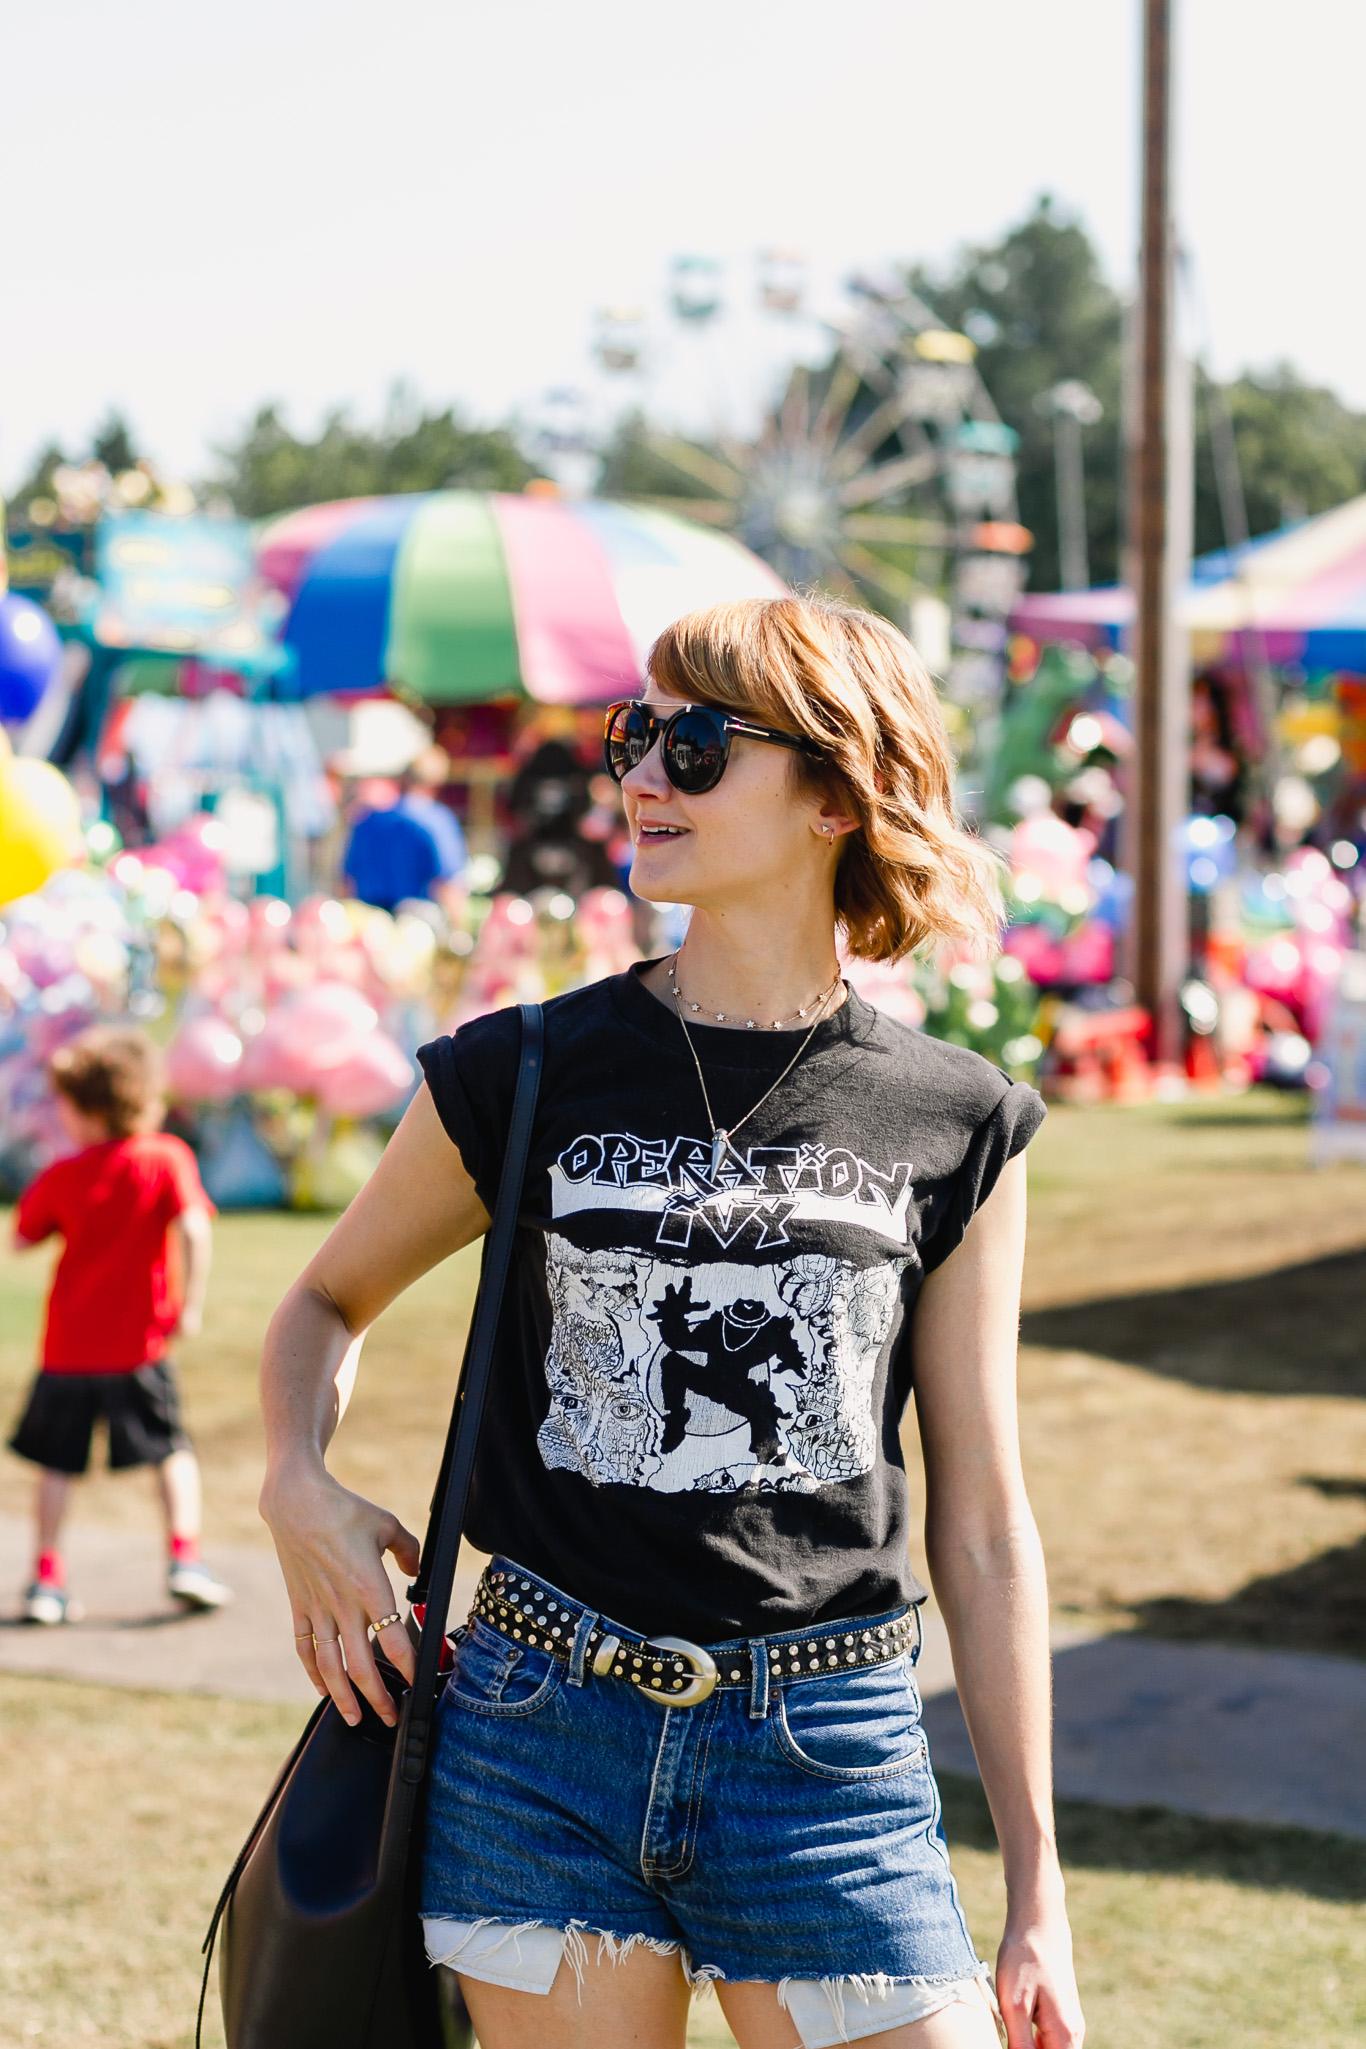 Op Ivy t-shirt, denim shorts, and Topshop western belt